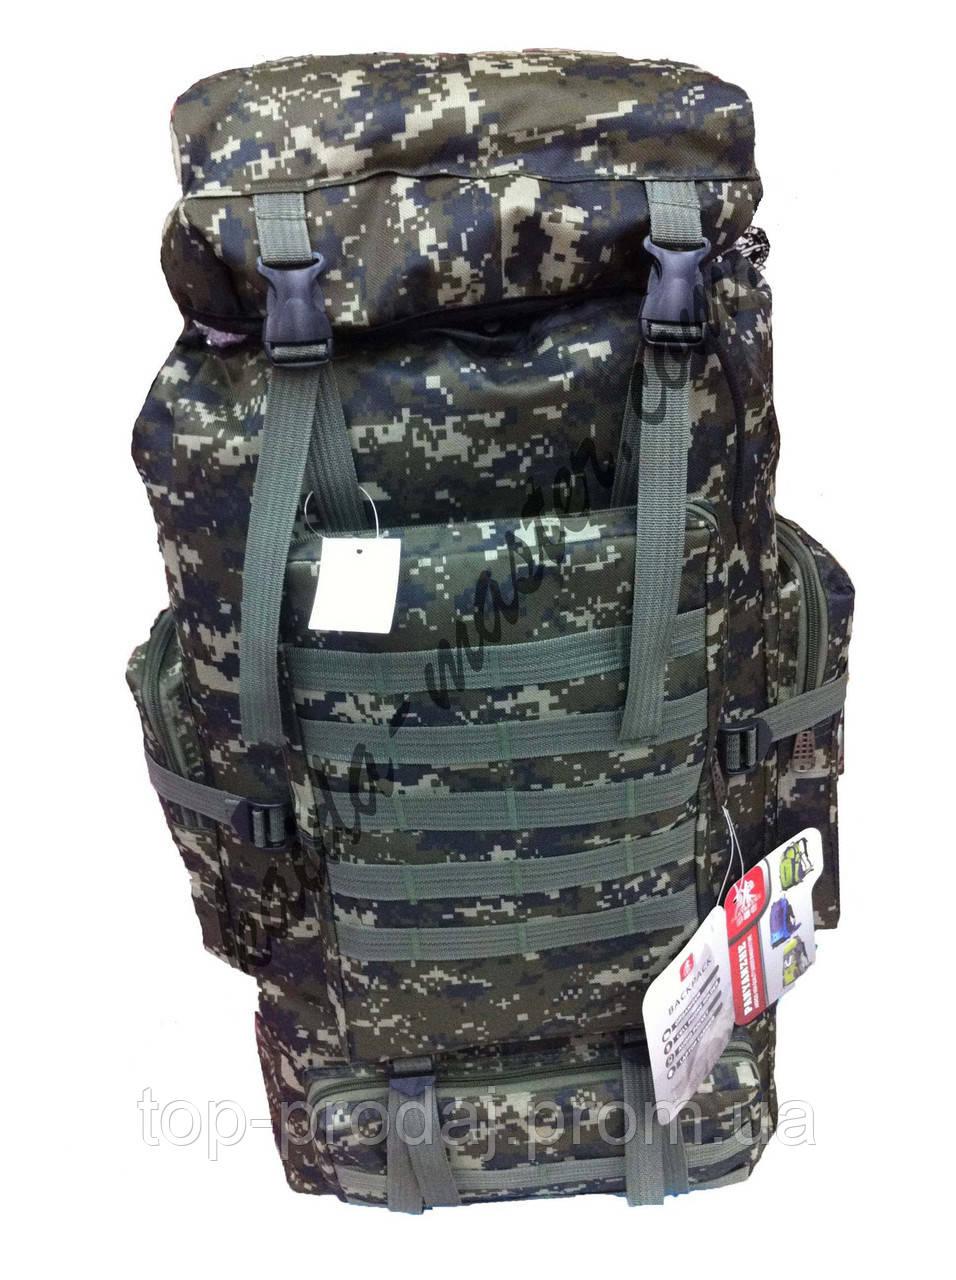 Туристический рюкзак Kaida 70л, Рюкзак для похода на 70 литров, Большой рюкзак для туризма